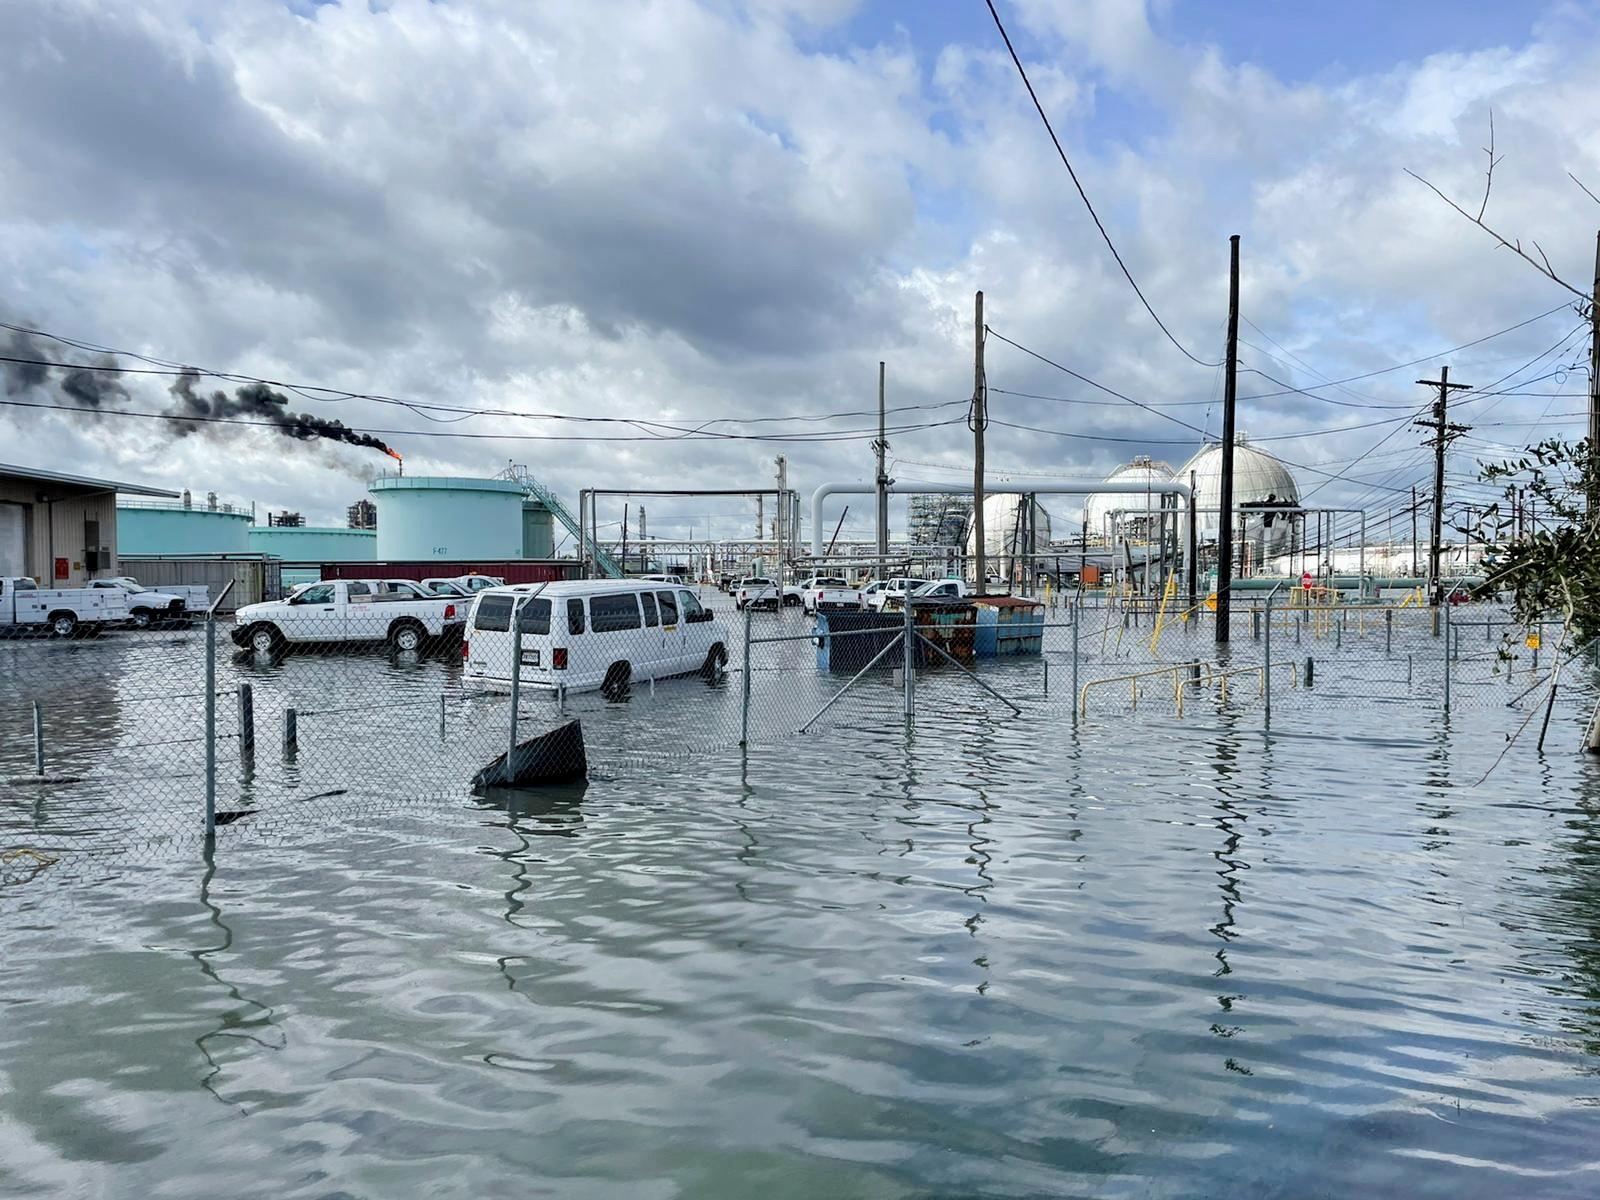 The Shell Norco manufacturing facility is flooded after Hurricane Ida pummeled Norco, Louisiana, U.S., Aug. 30, 2021. REUTERS/Devika Krishna Kumar/File Photo